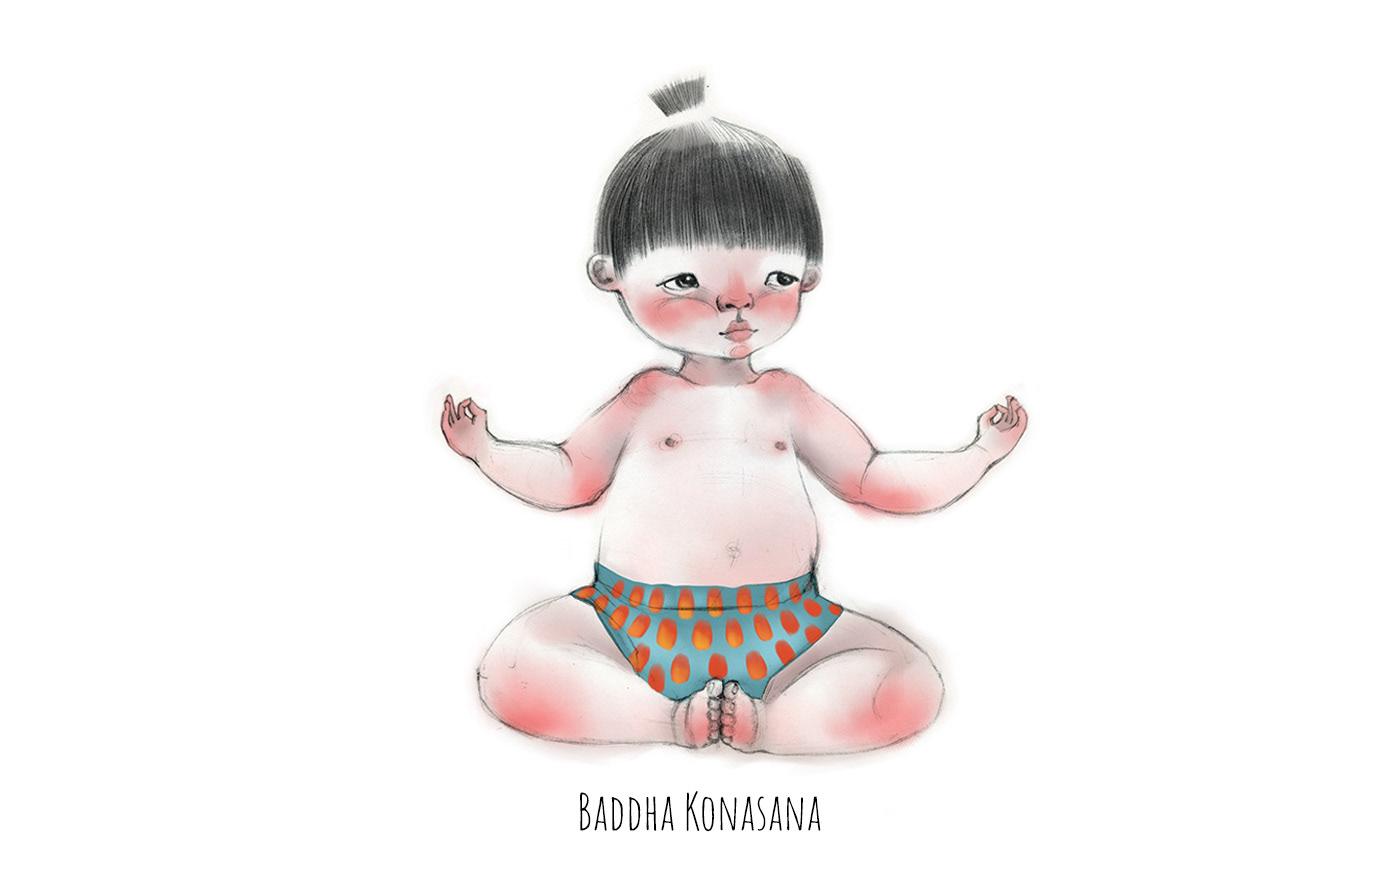 Image may contain: toddler, baby and cartoon